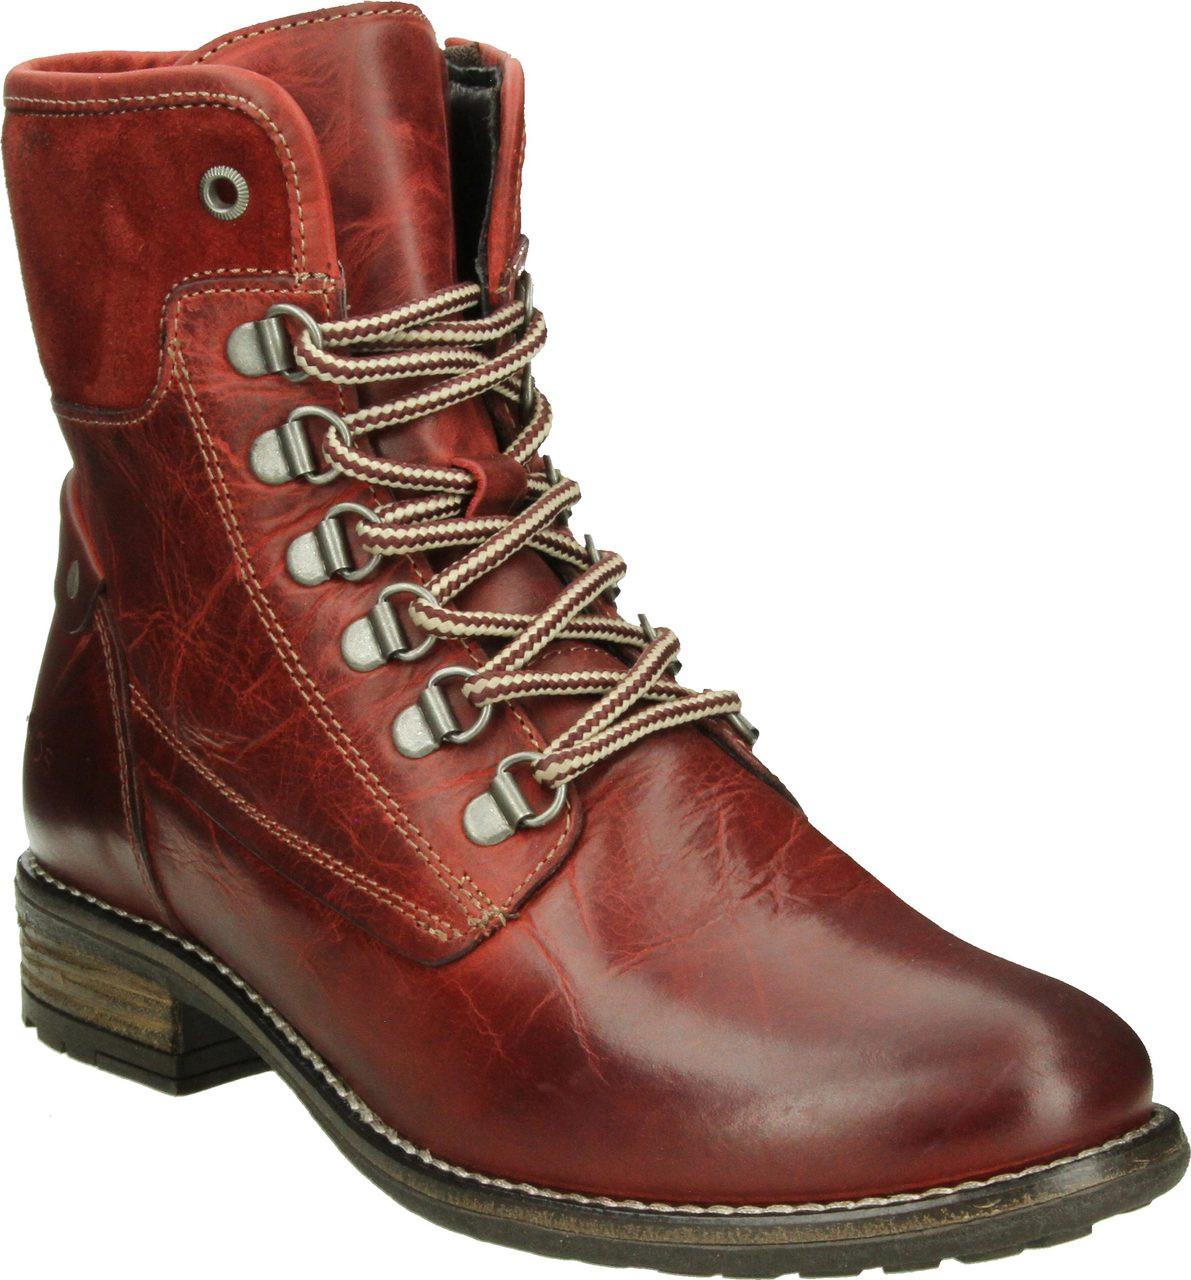 Taos Ringer Free Shipping Amp Free Returns Women S Boots